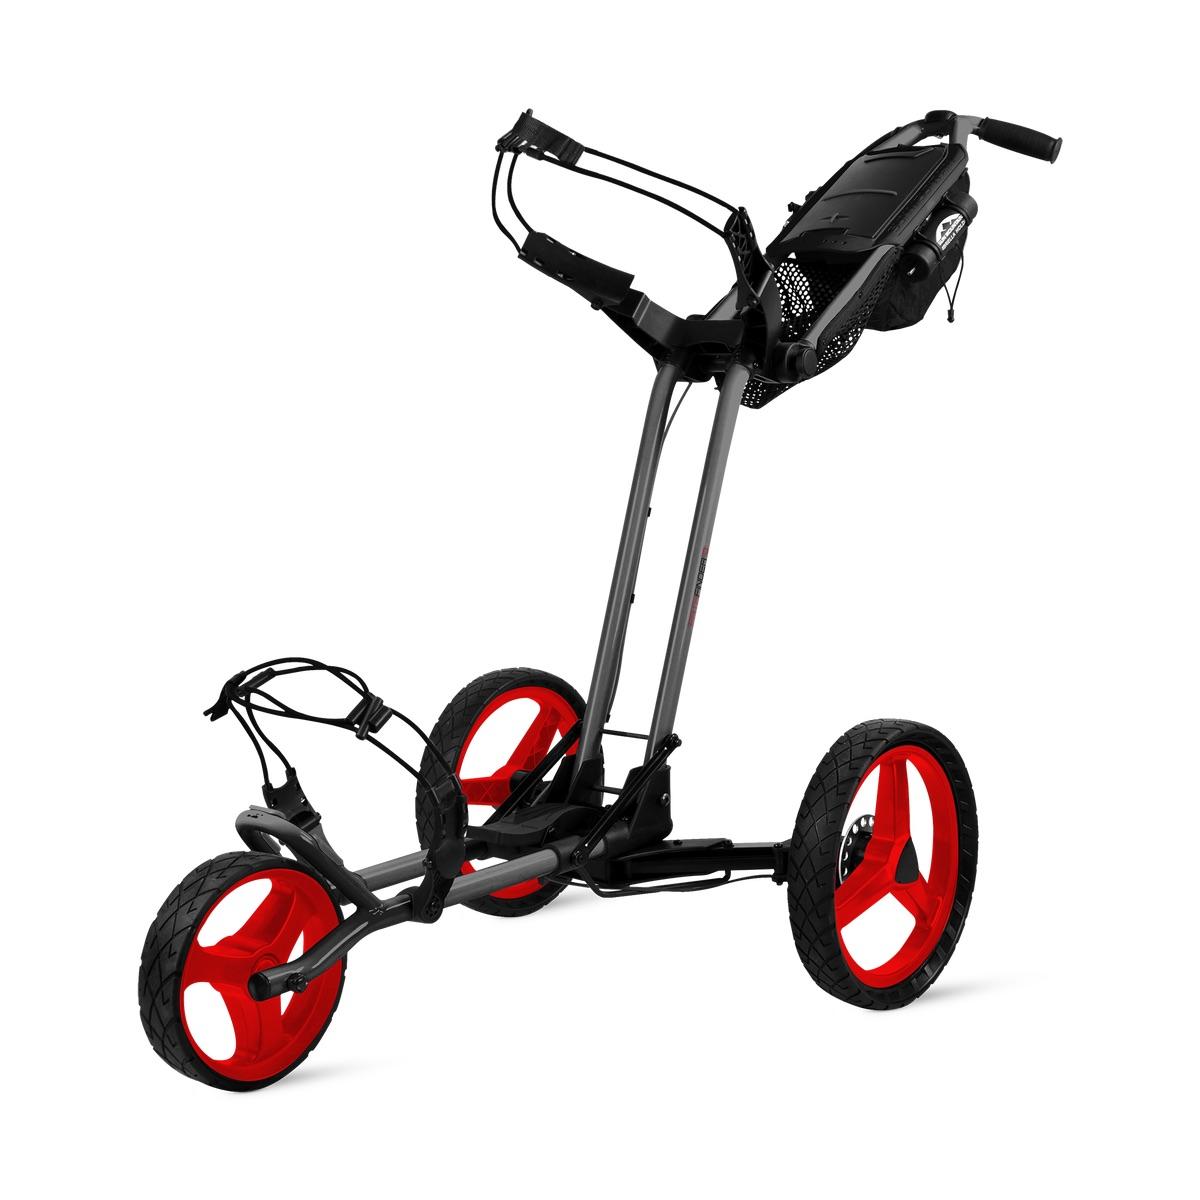 Sun Mountain Pathfinder 3 Push Cart: Walk your own path